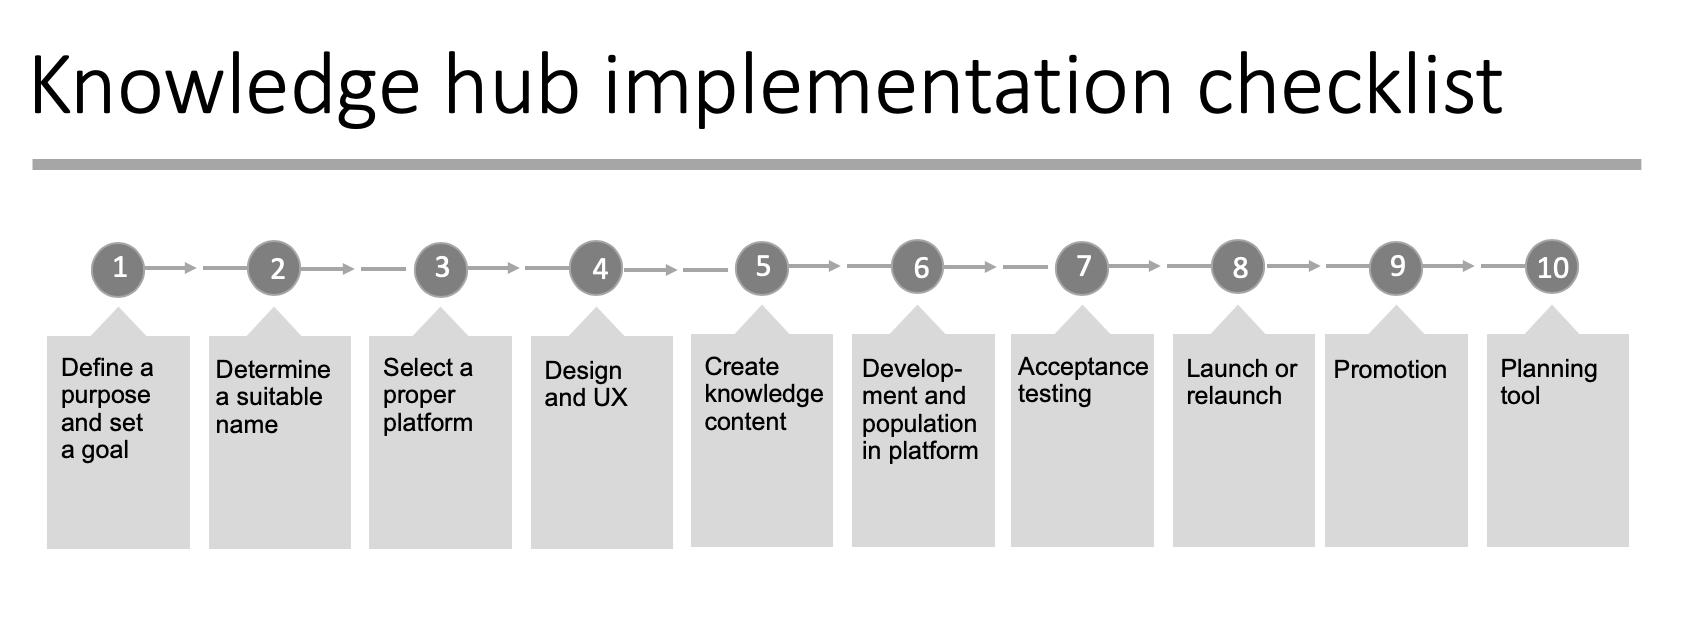 Knowledge  hub implementation checklist